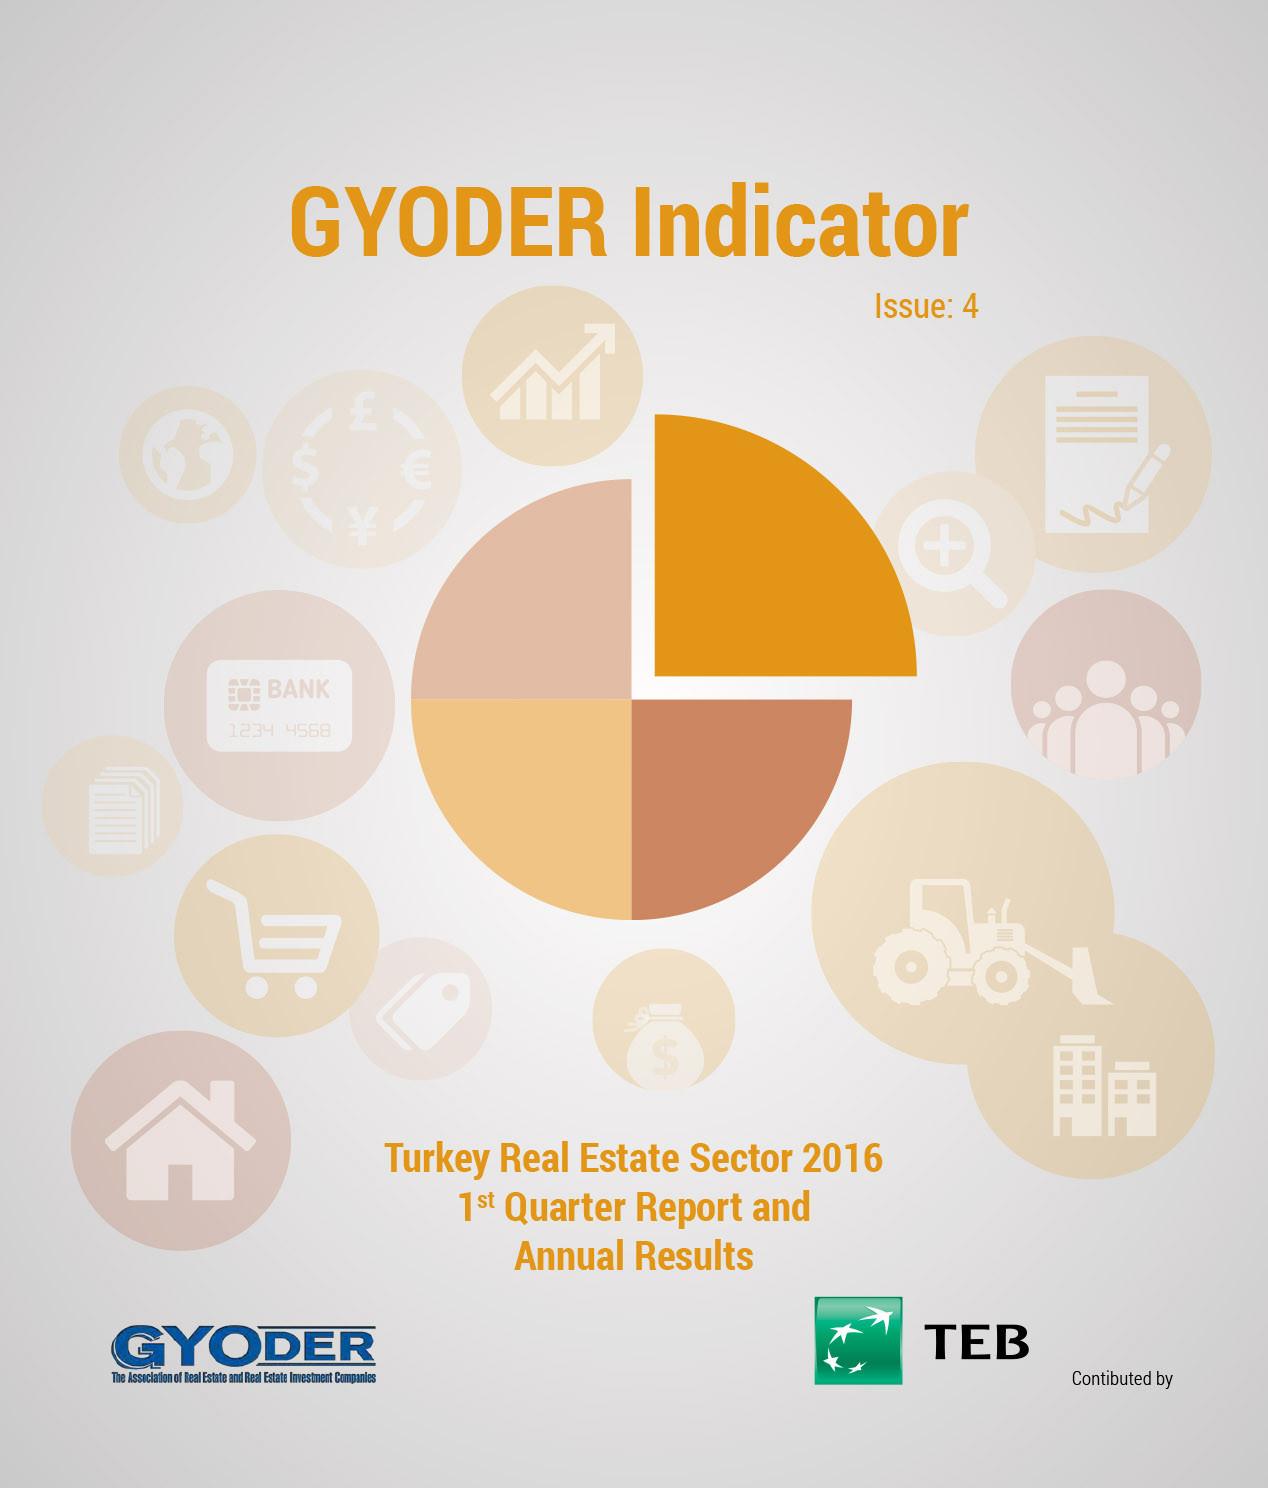 GYODER Indicator, Turkish Real Estate Sector 2016 1st Quarter Report